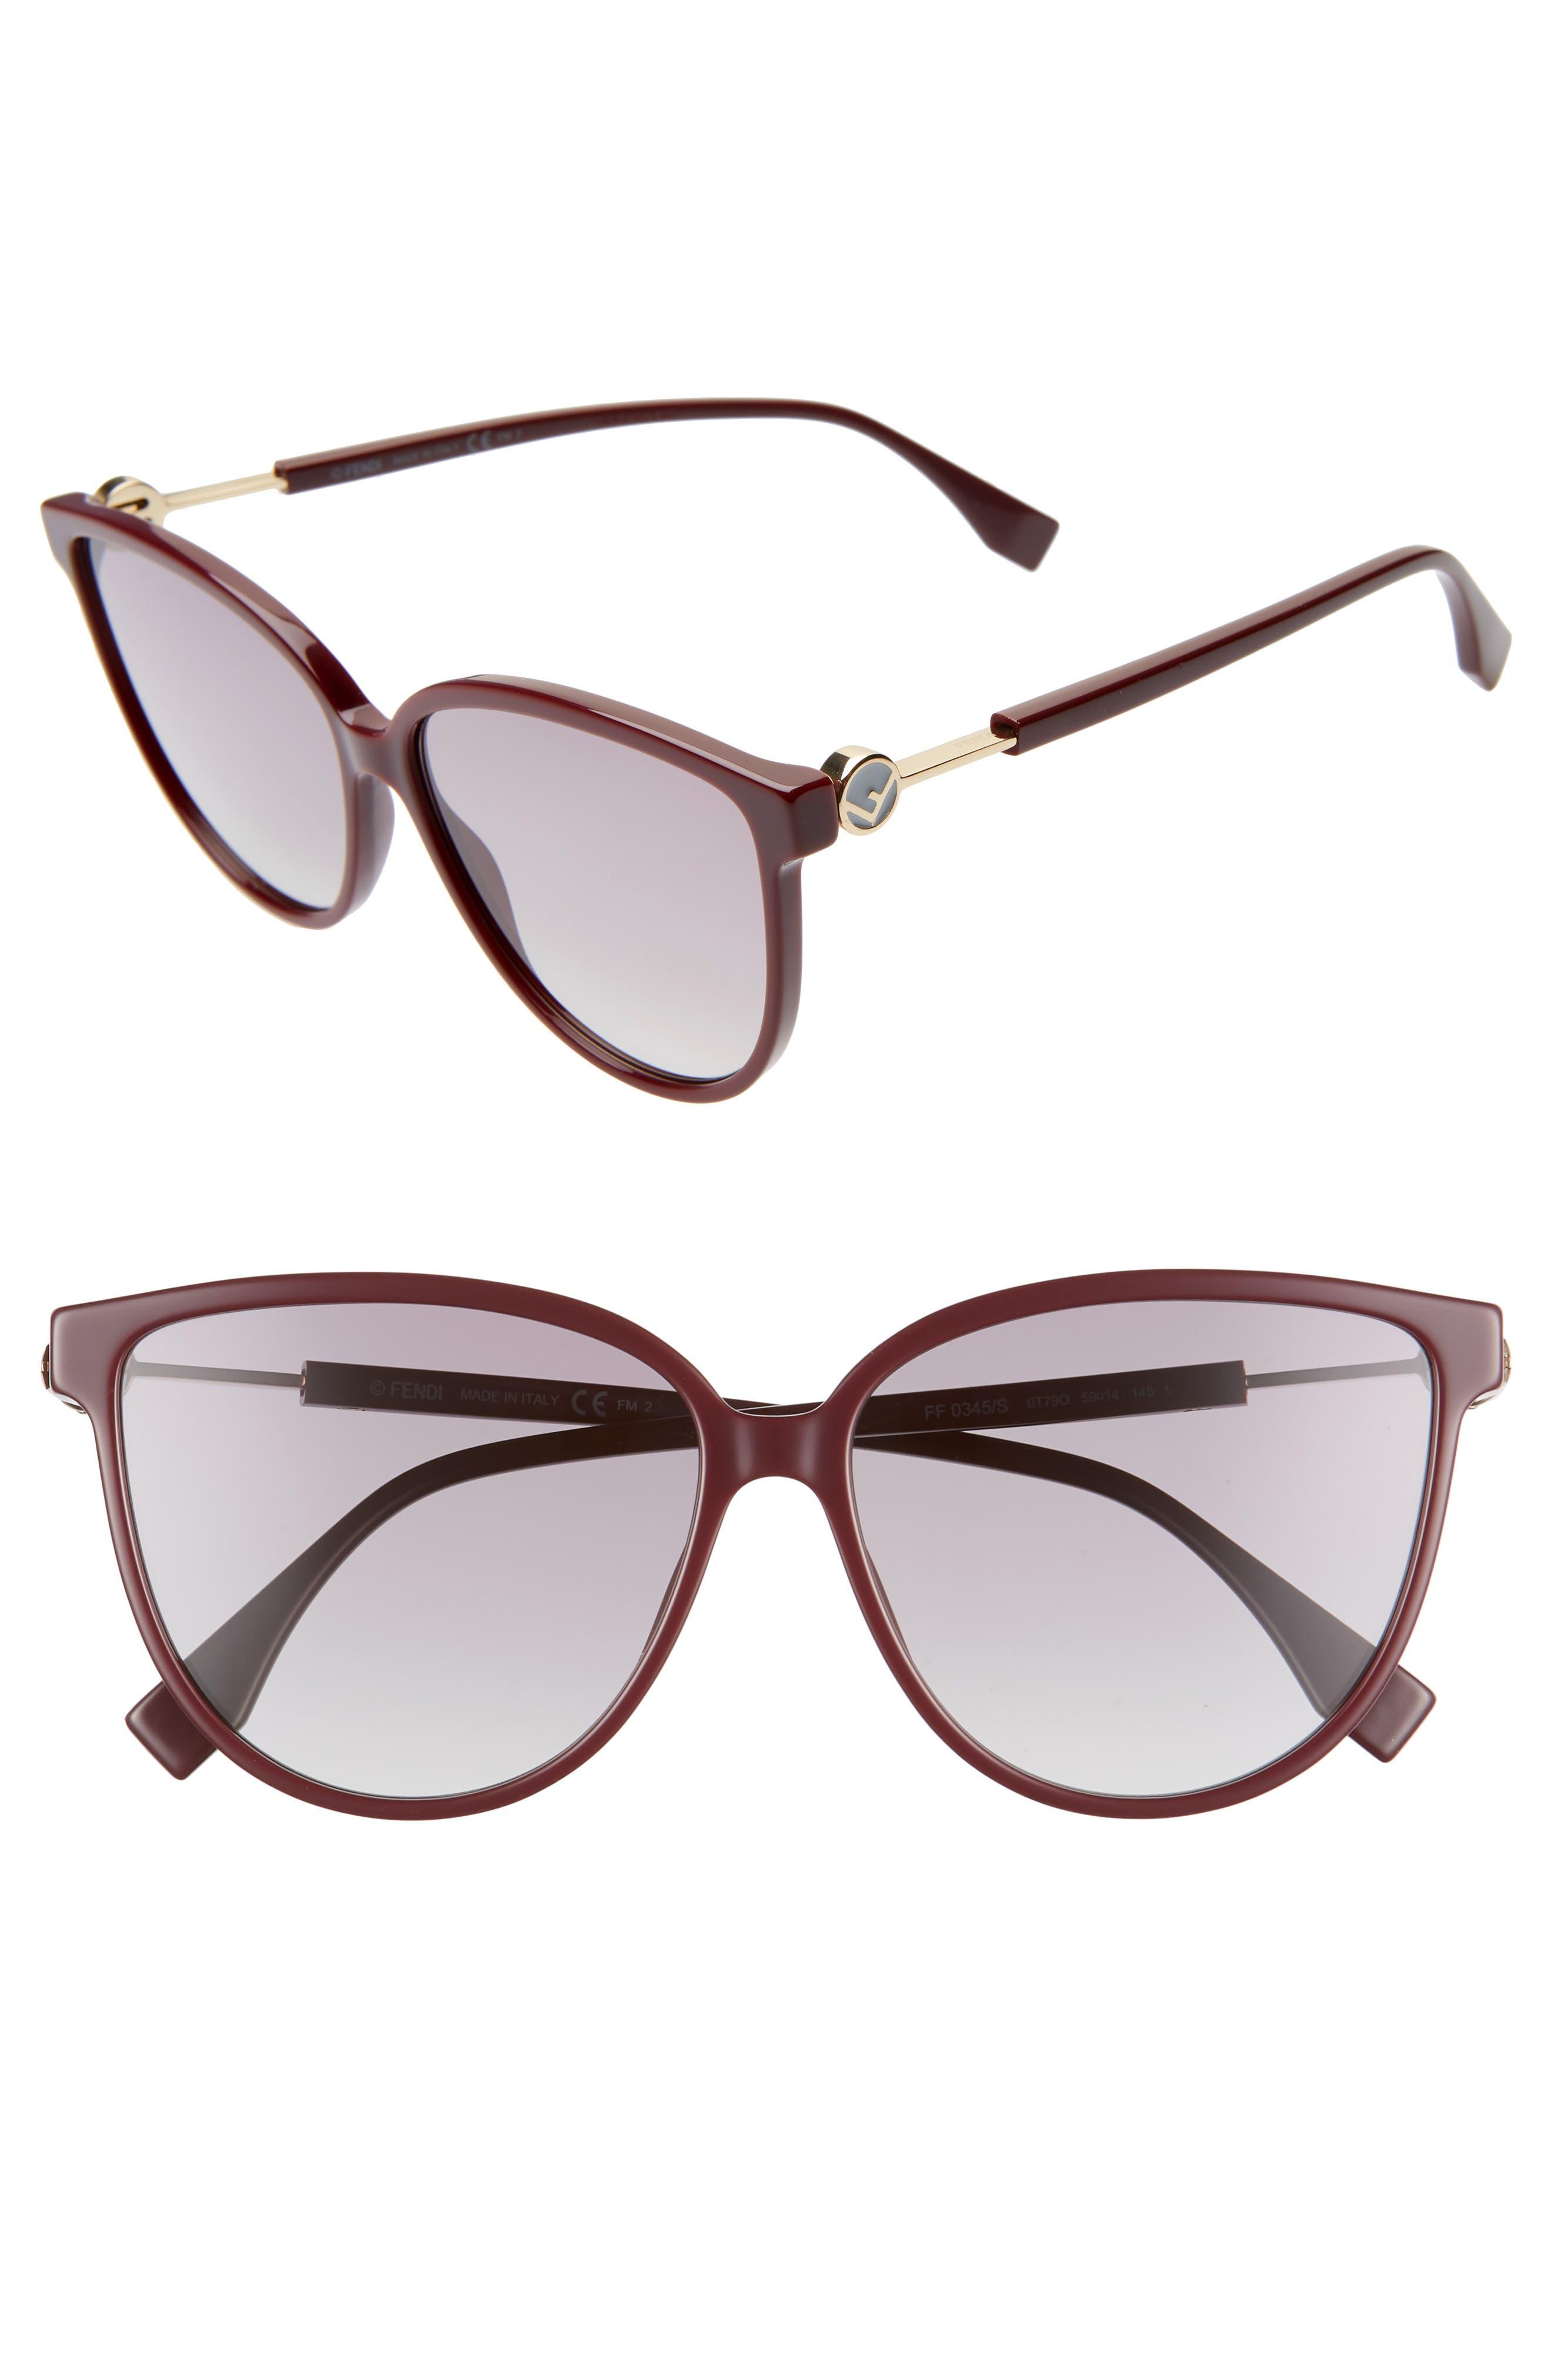 46fb3b6bba7 Cat-Eye Fendi Sunglasses for Women